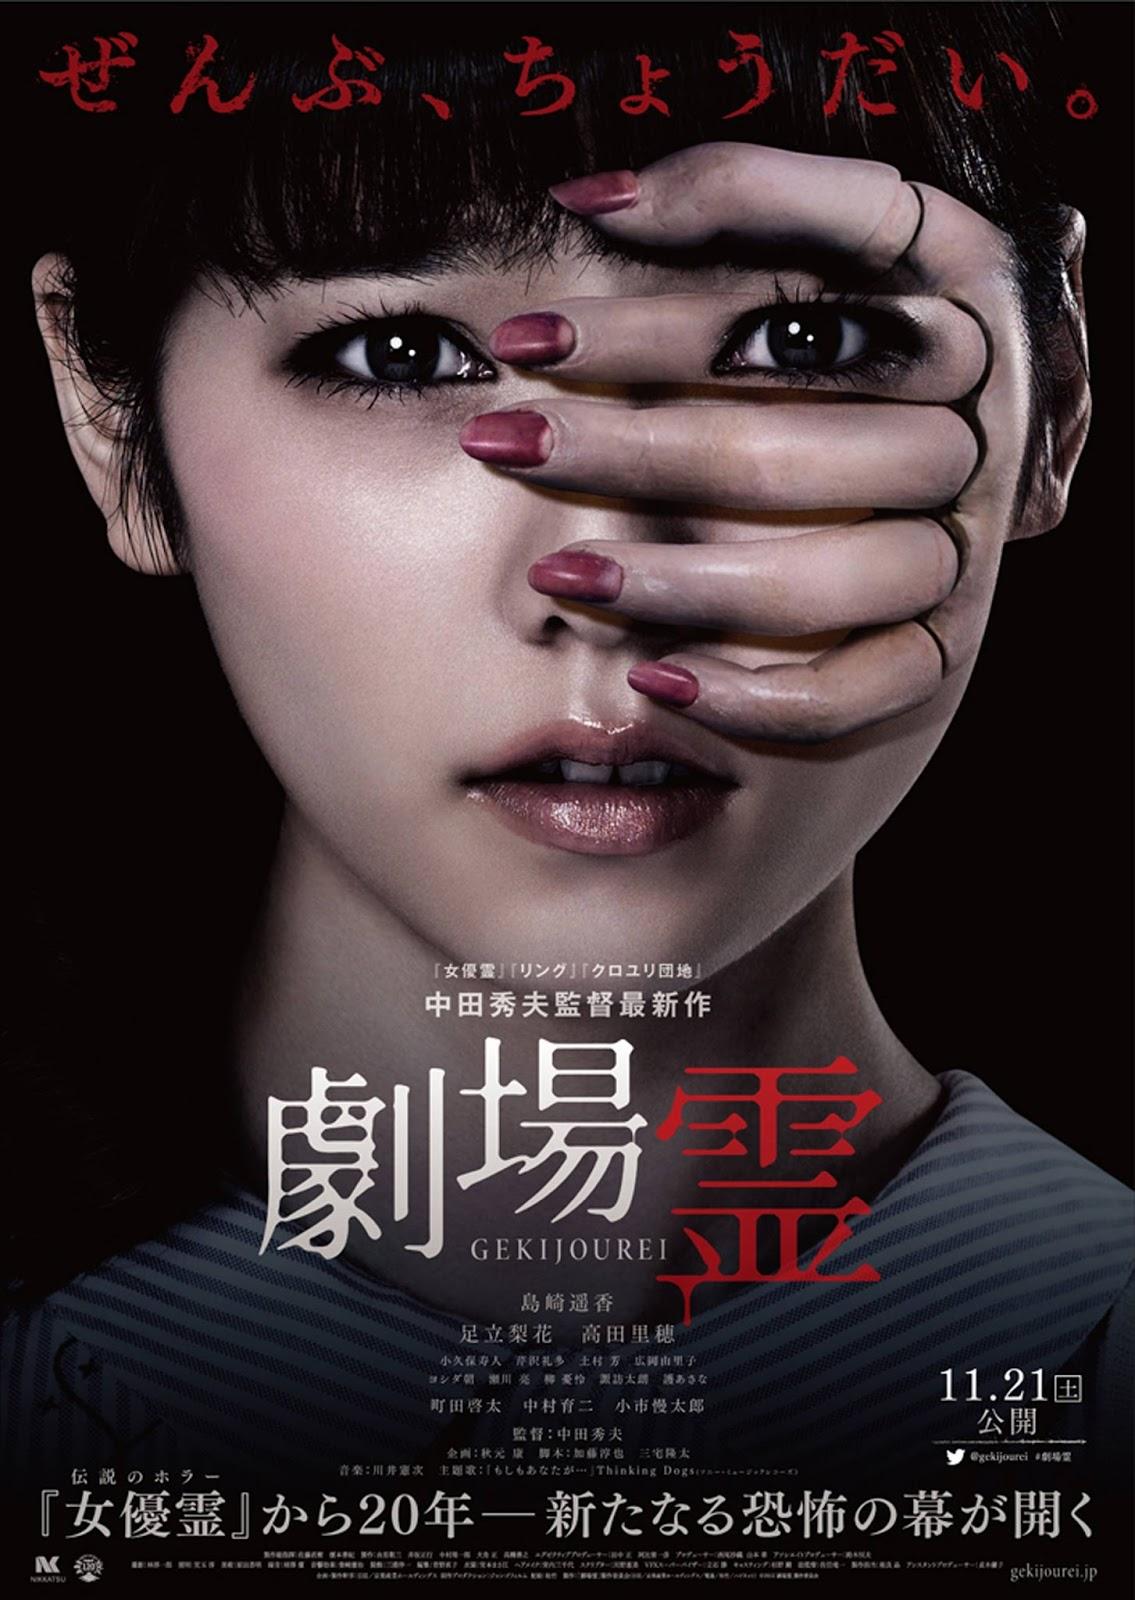 Gekijô rei (2015)